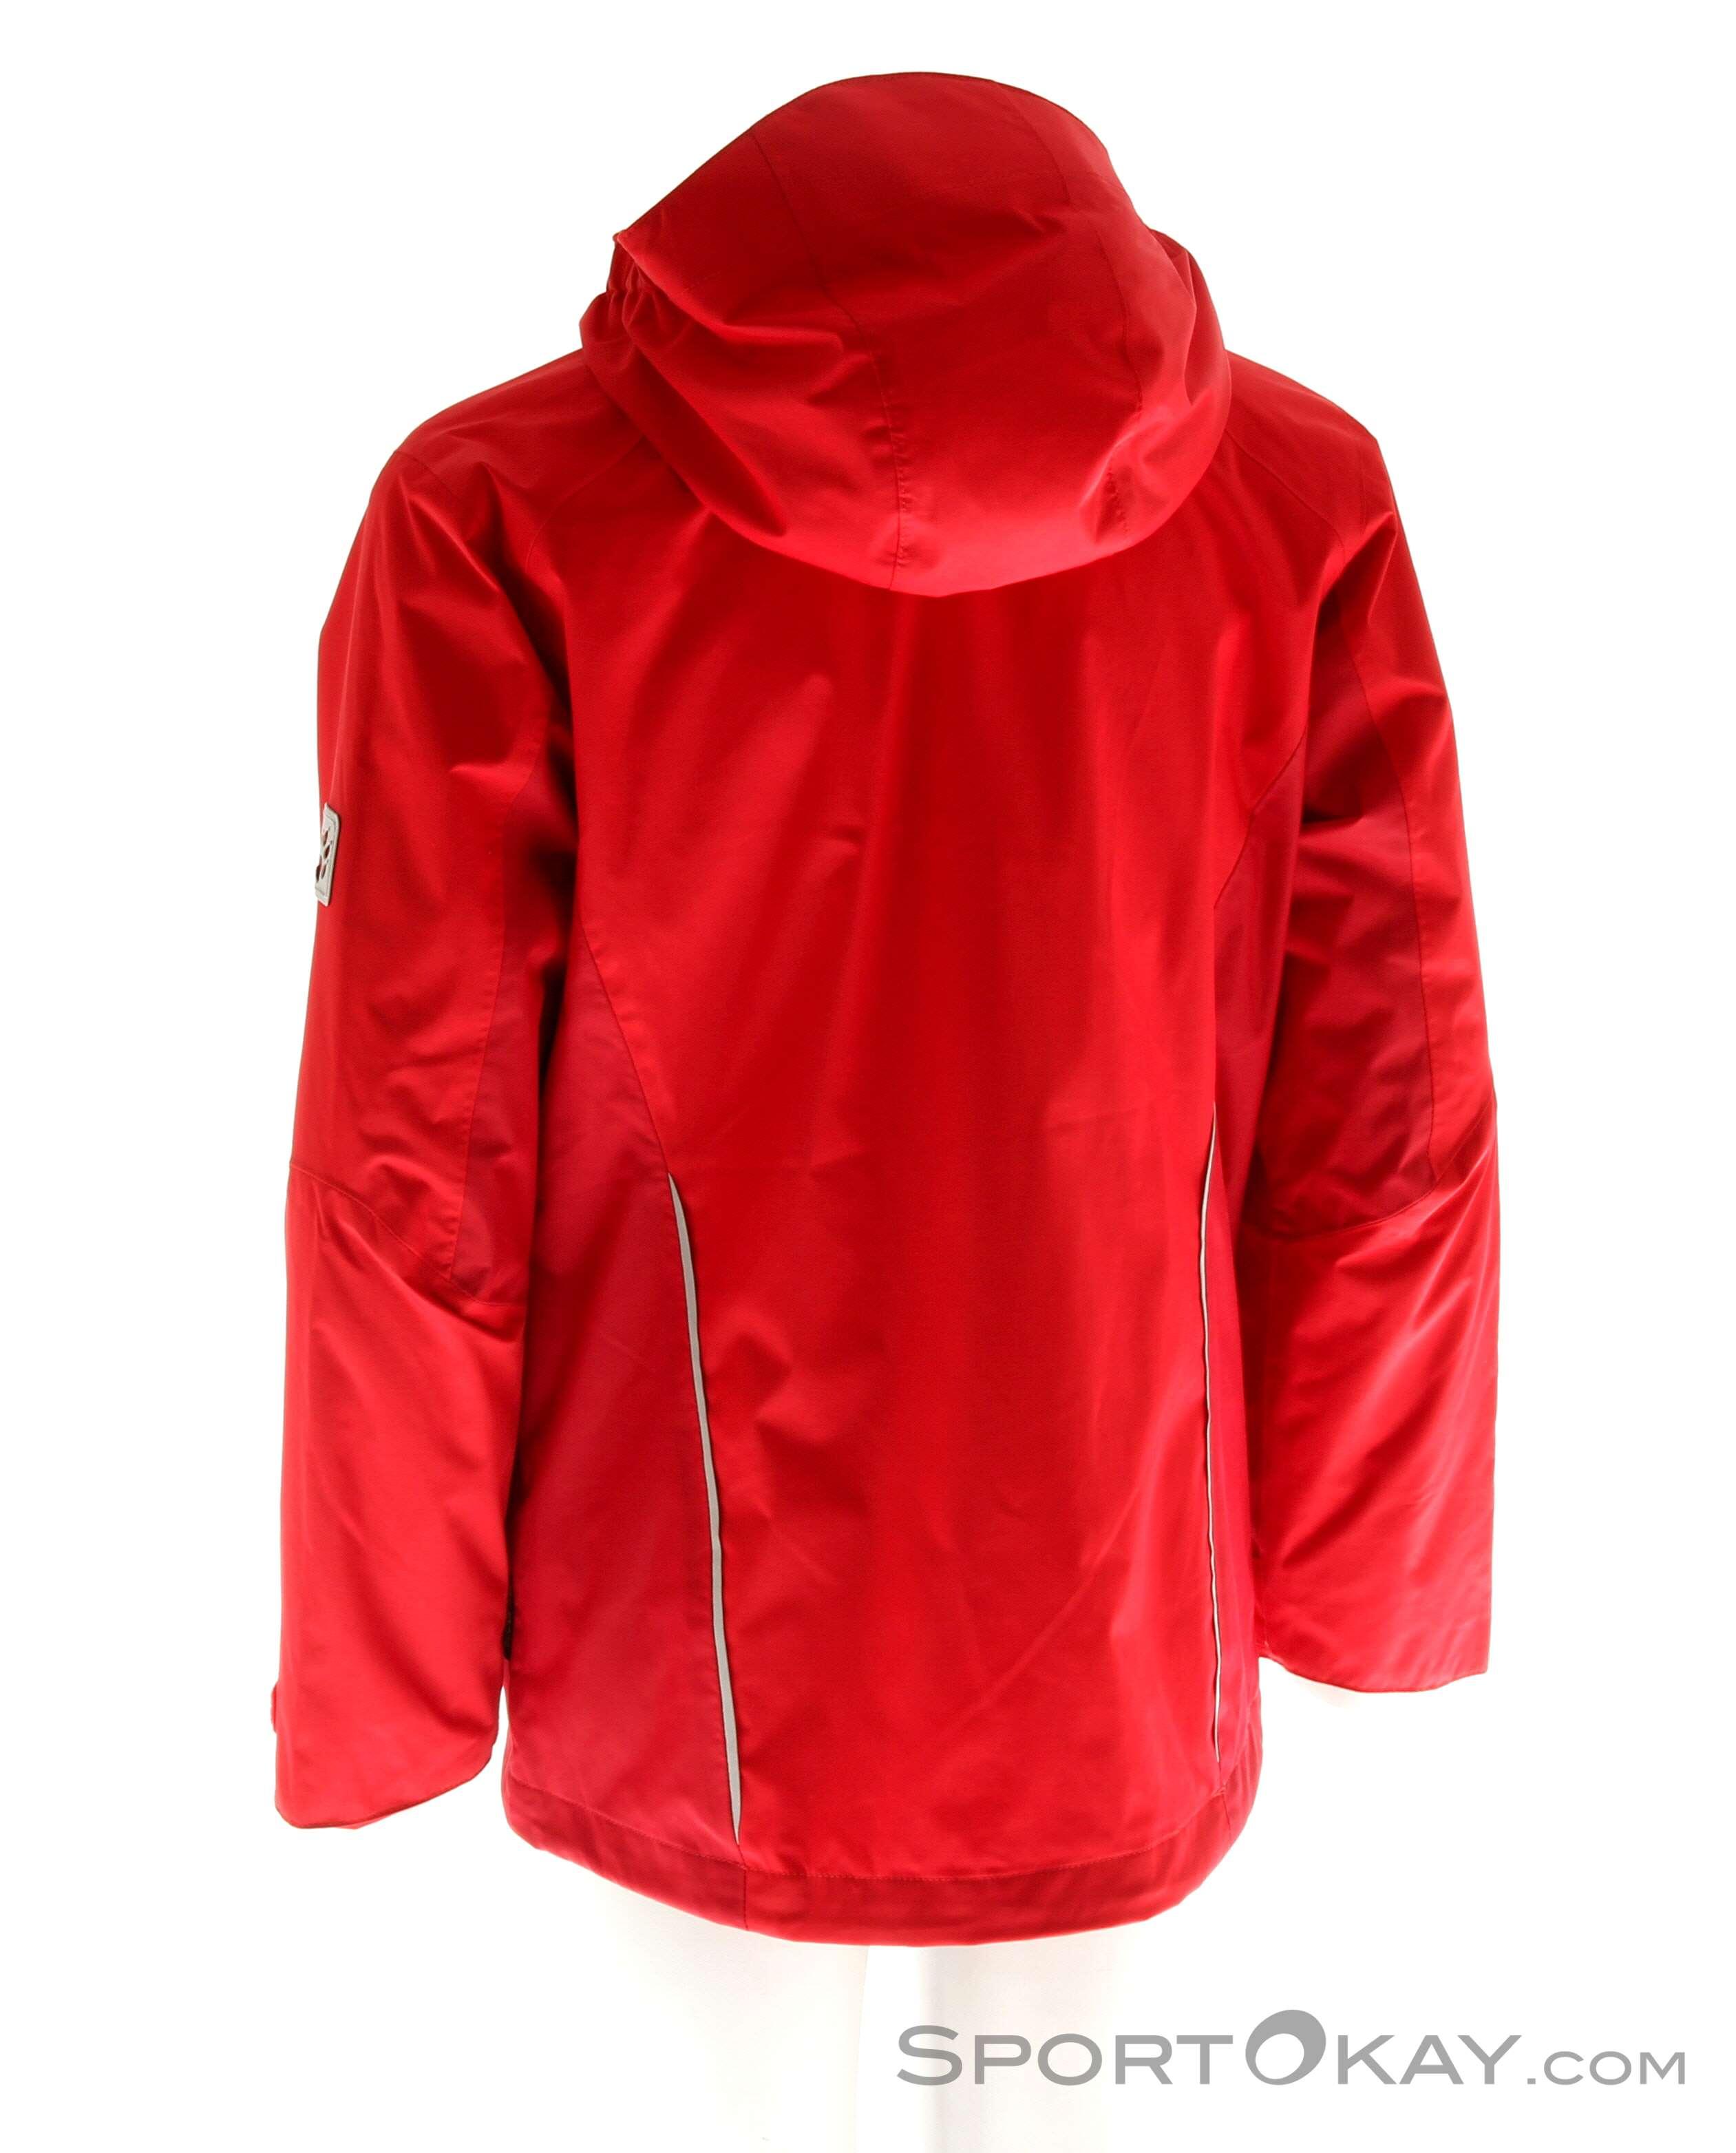 ddd0e19e0 Jack Wolfskin Grivla 3in1 Girls Outdoor Jacket - Jackets - Outdoor ...